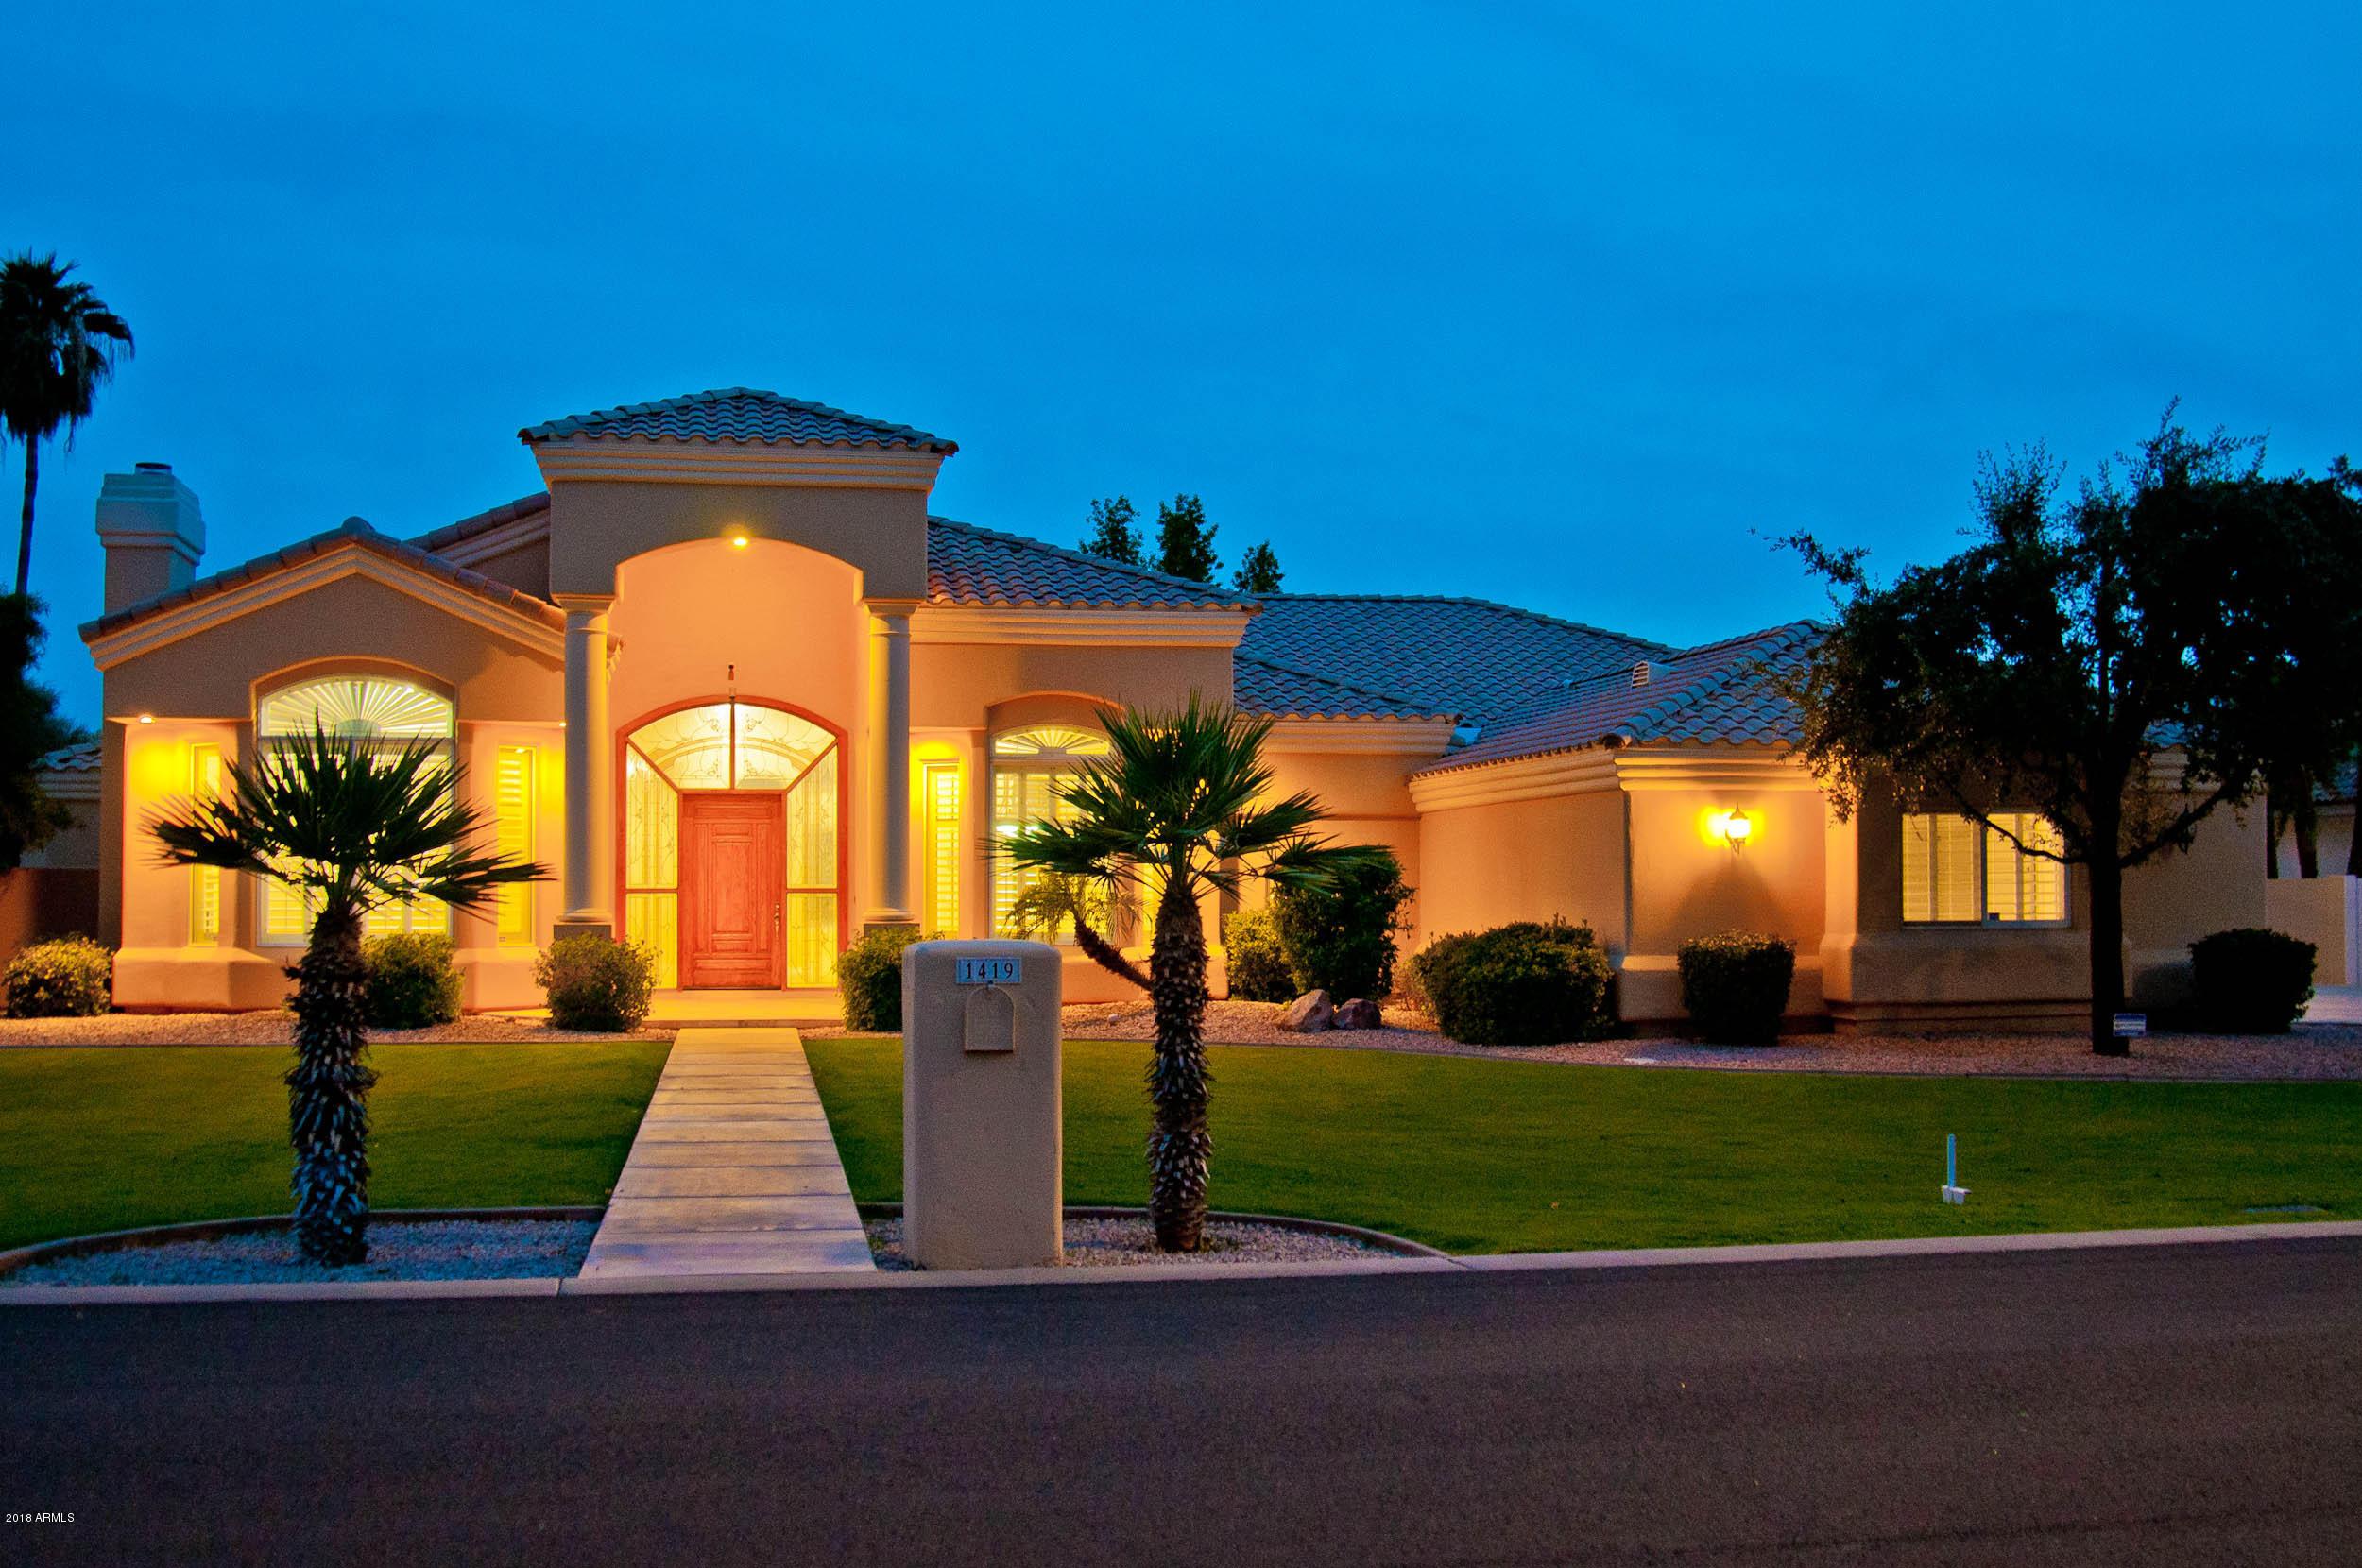 MLS 5856902 1419 E PALOMINO Drive, Tempe, AZ 85284 Tempe AZ